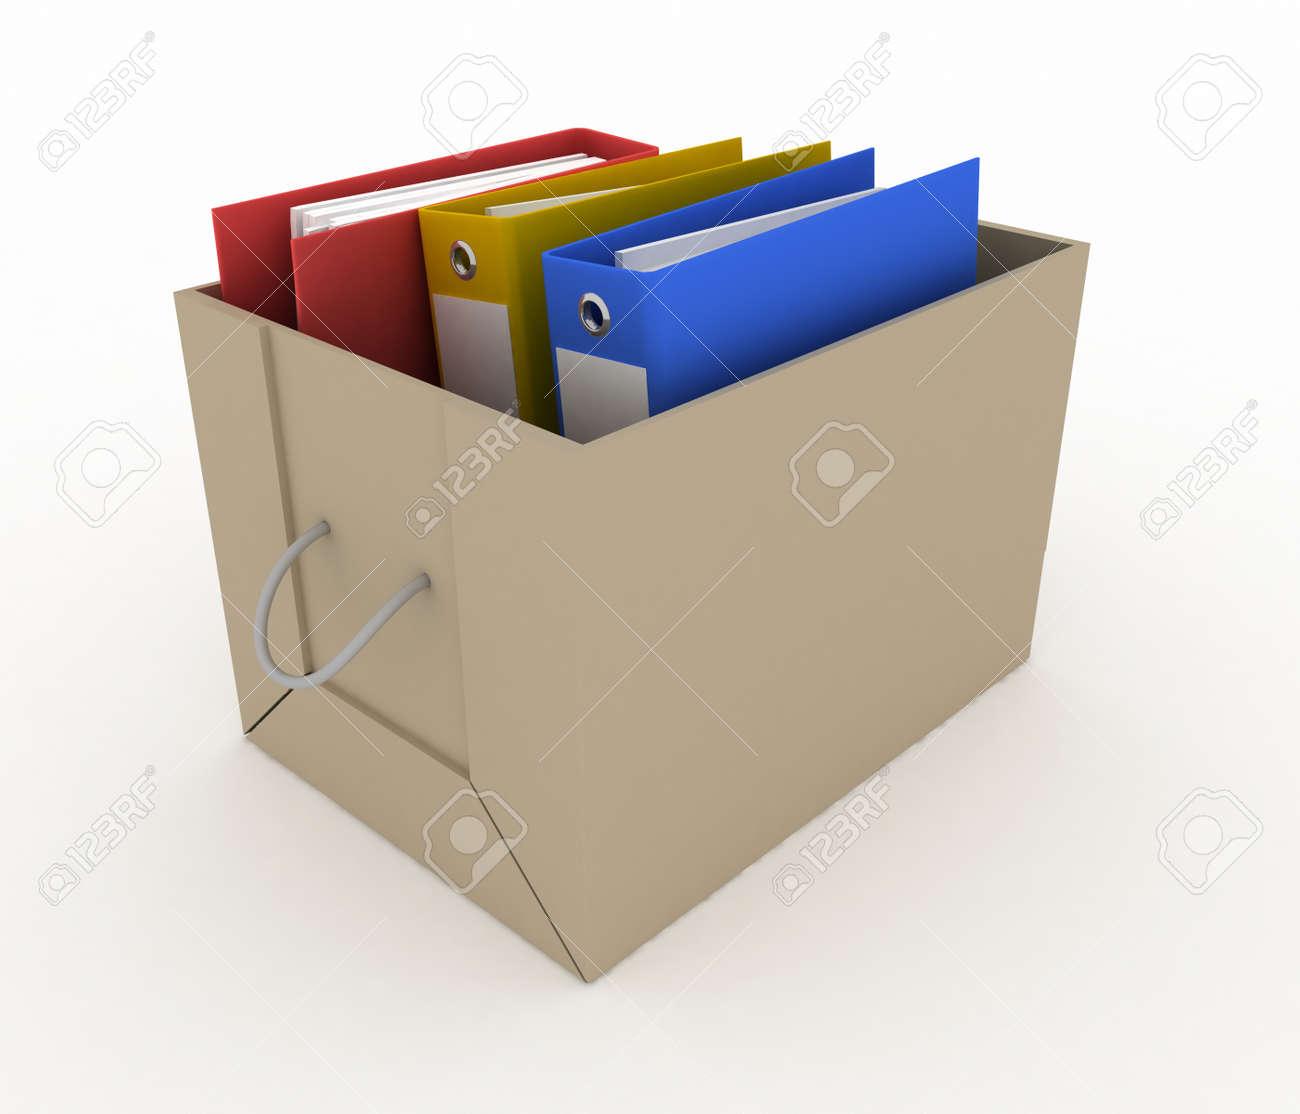 office folders in cardboard box on white background